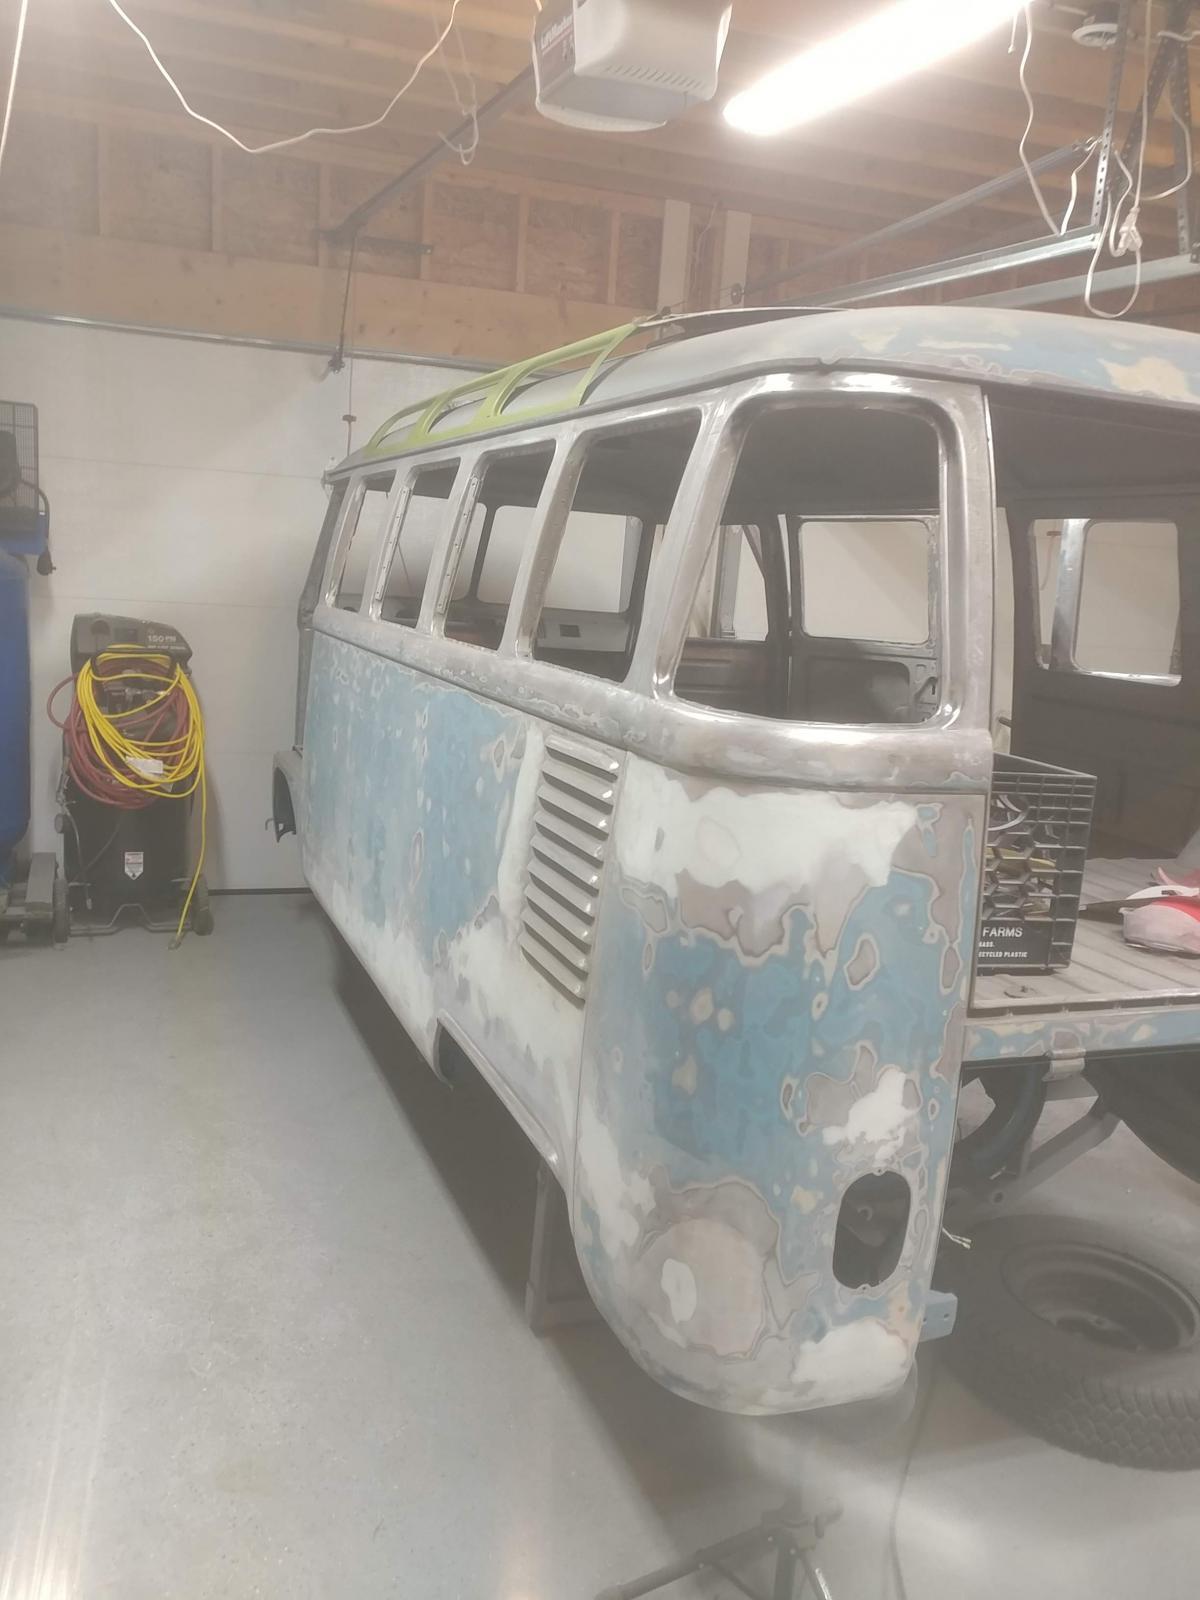 Sanding the bus body